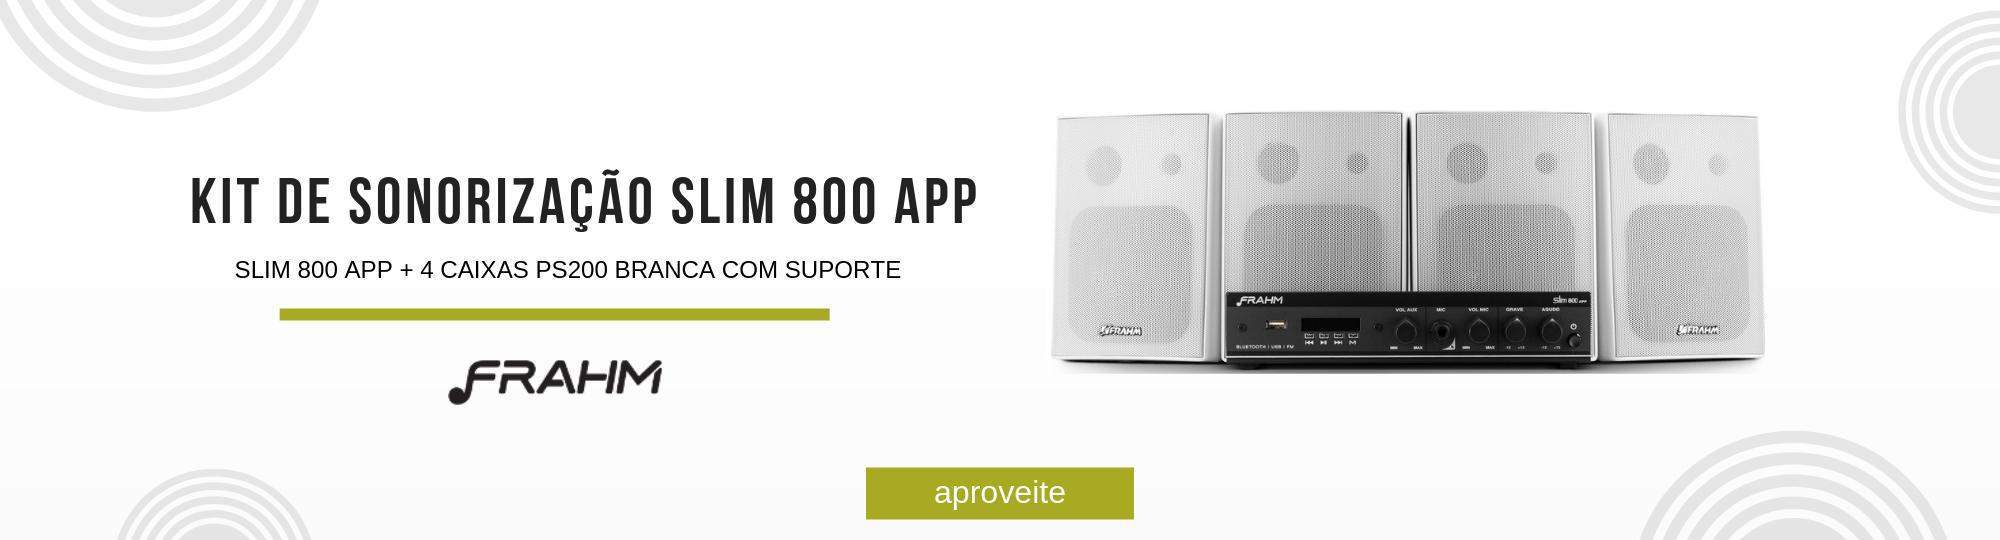 oferta kit de sonorização slim 800 app frahm - 31872